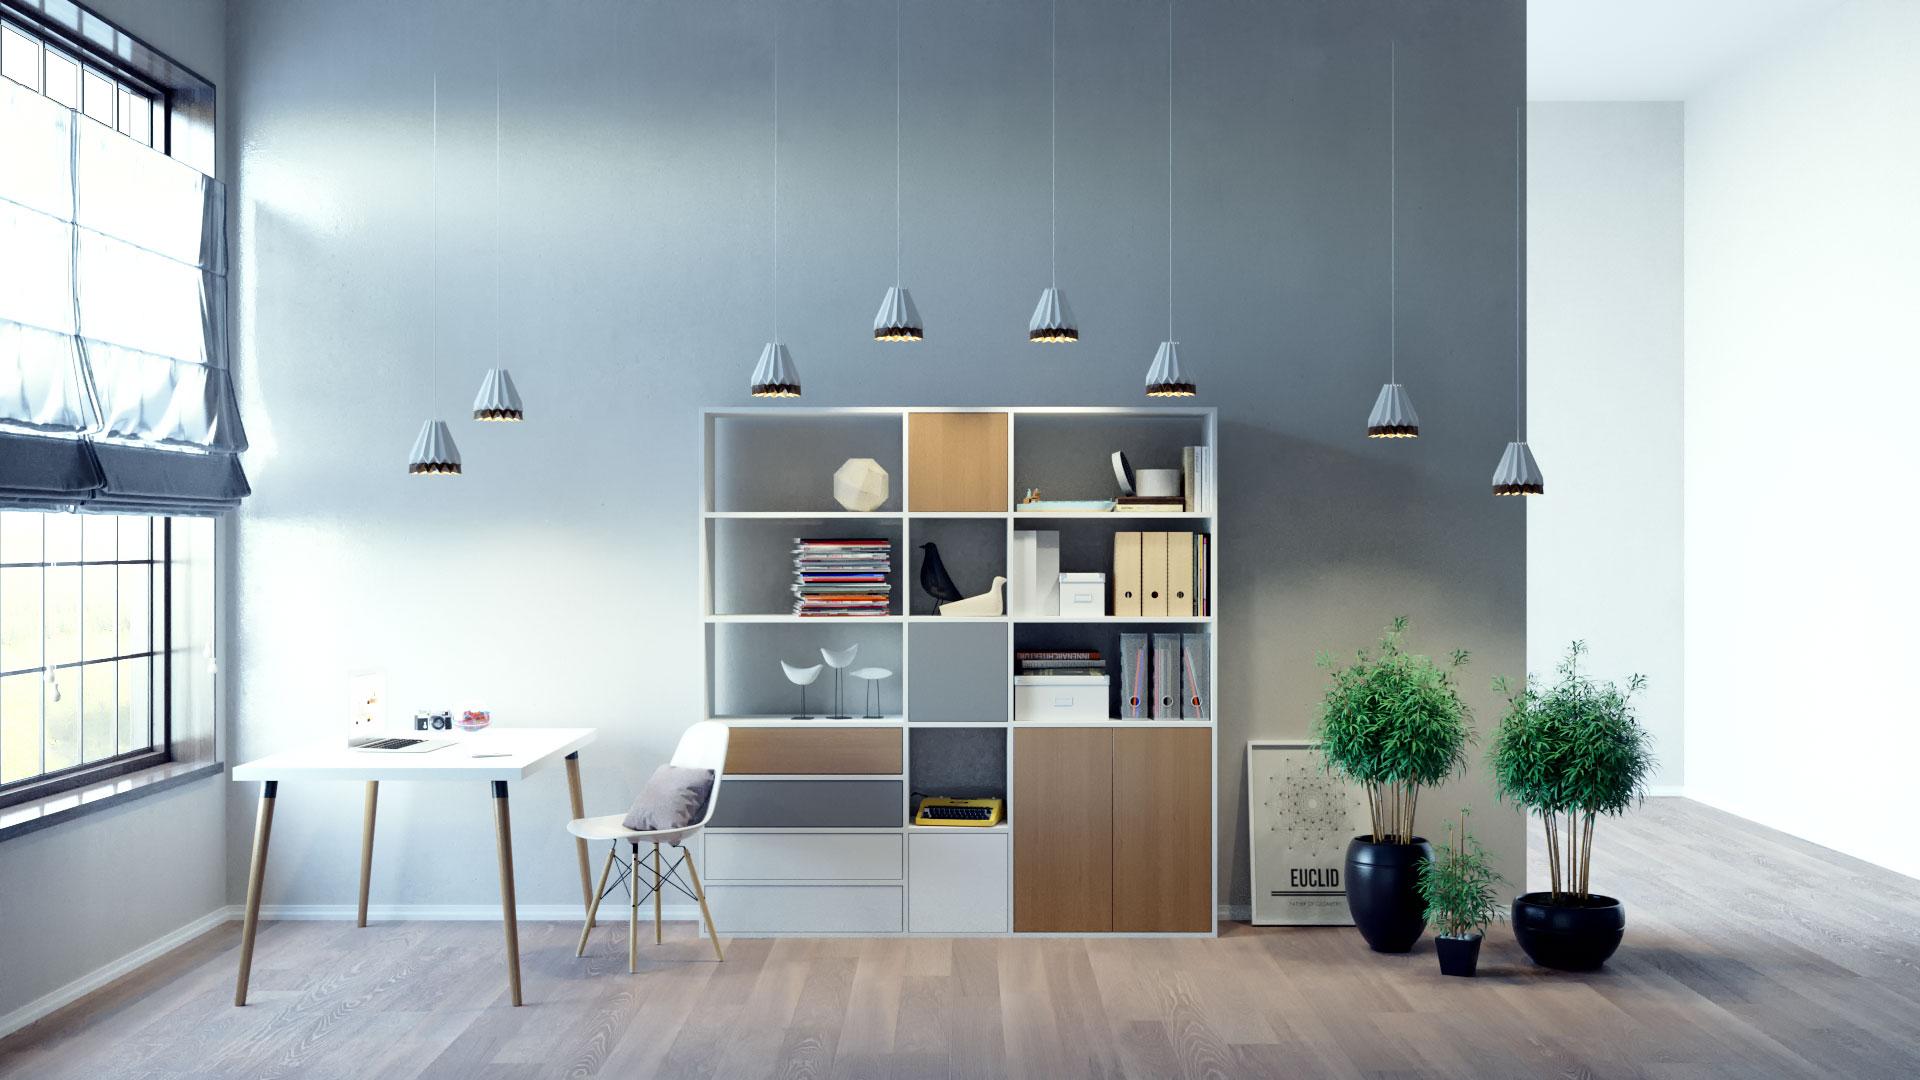 regalsysteme selbst gestalten regale bei mycs mycs deutschland. Black Bedroom Furniture Sets. Home Design Ideas